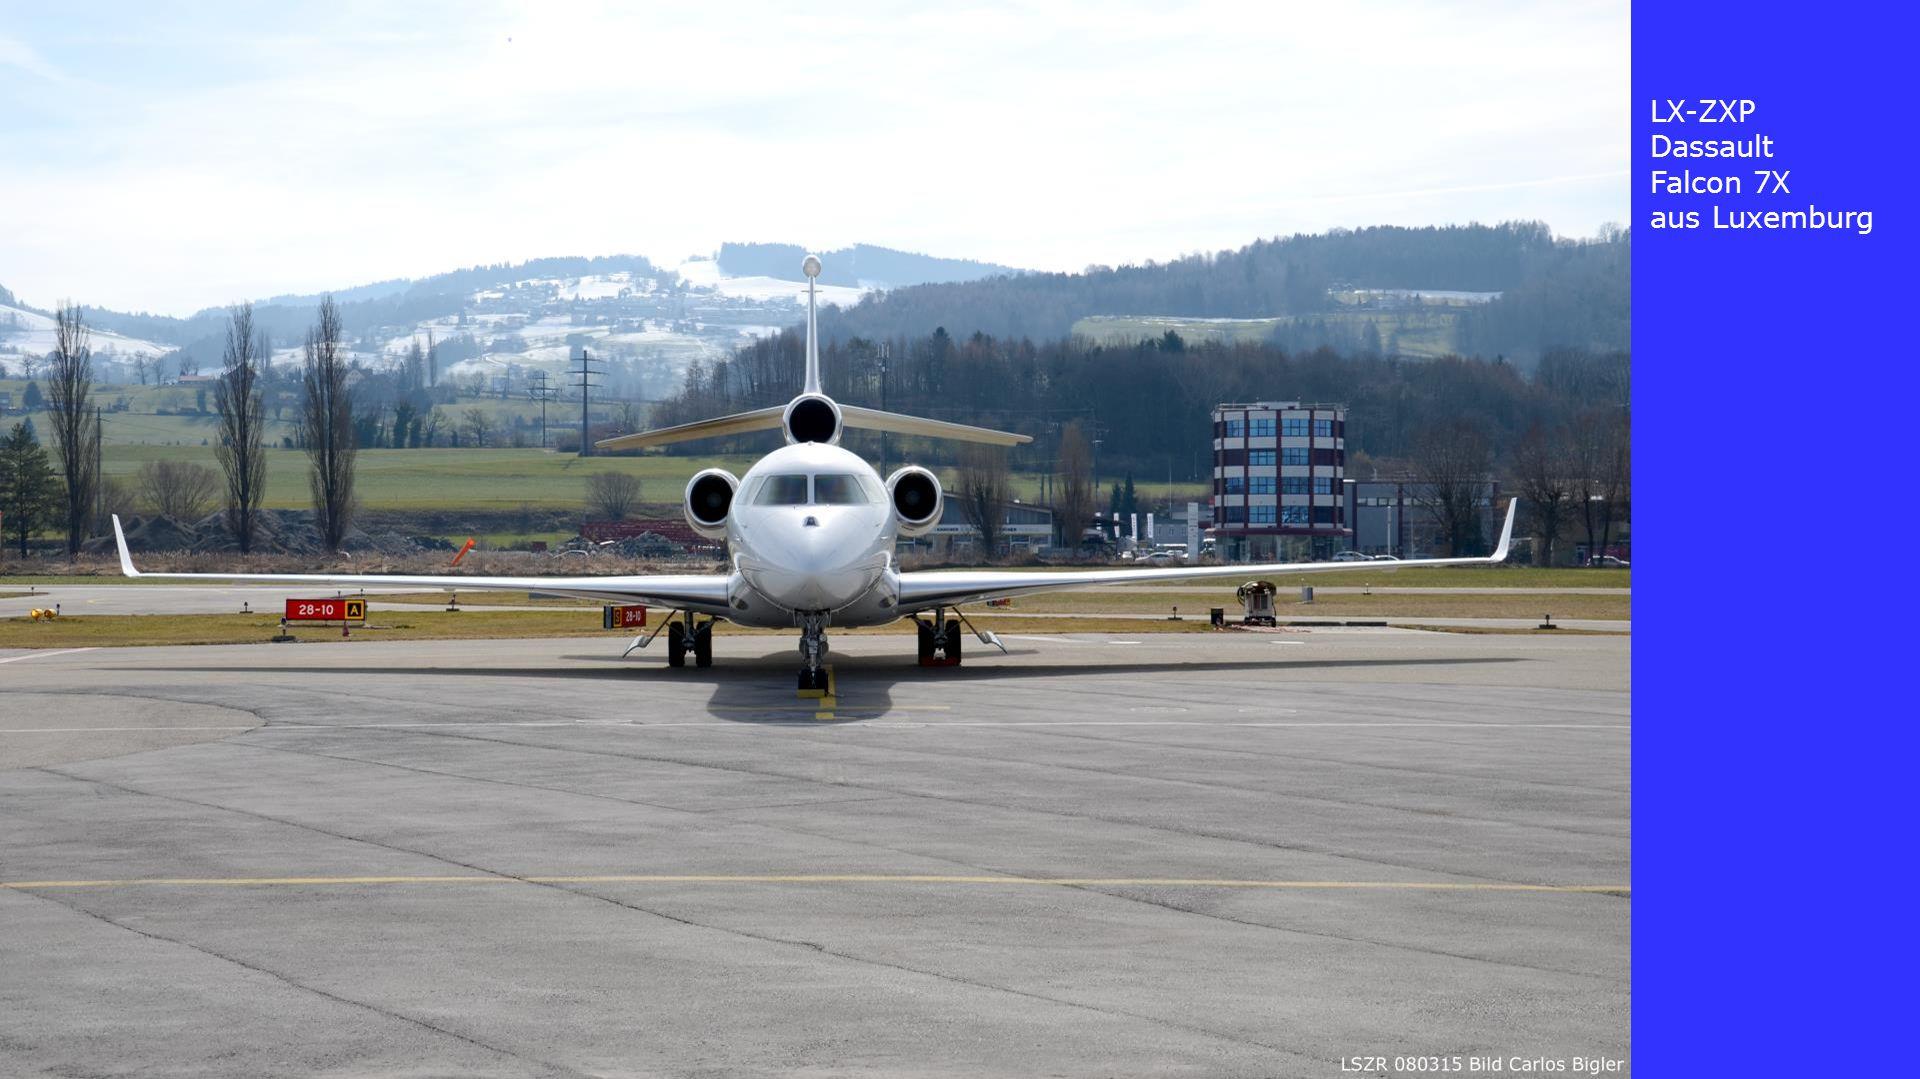 LX-ZXP Dassault Falcon 7X aus Luxemburg